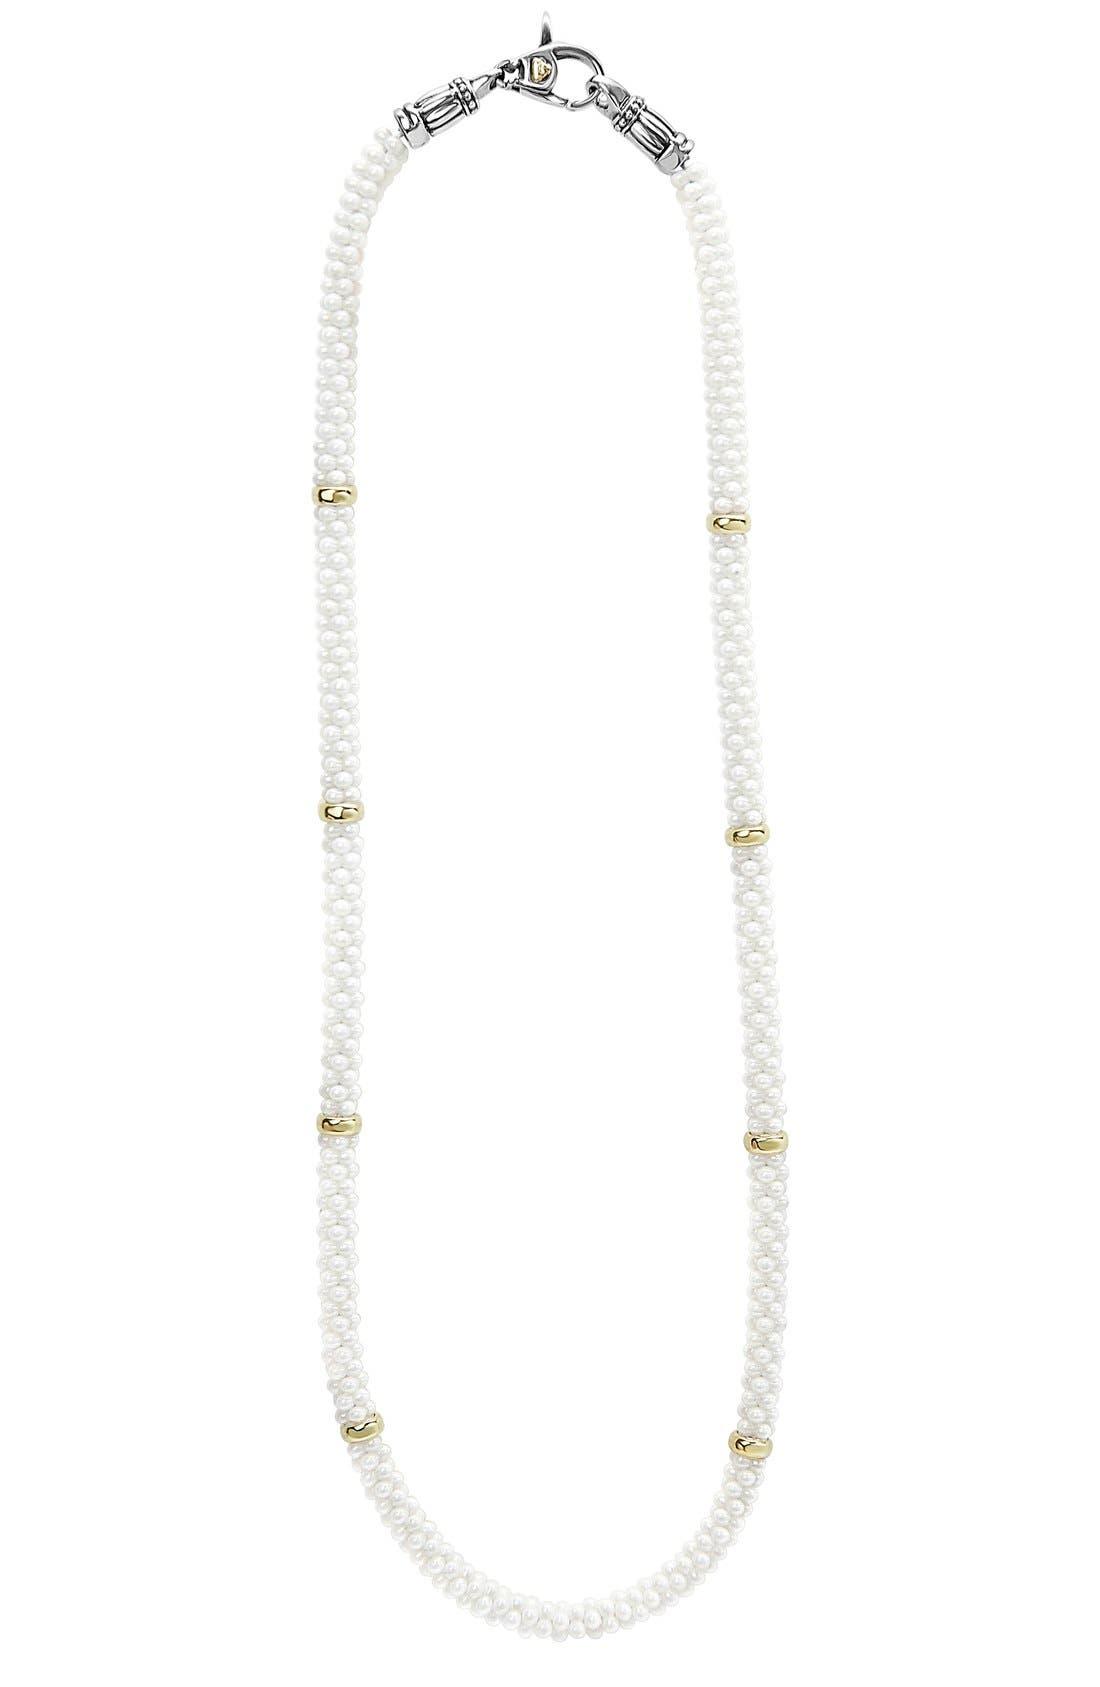 'White Caviar' 5mm Beaded Station Necklace,                         Main,                         color, White Caviar